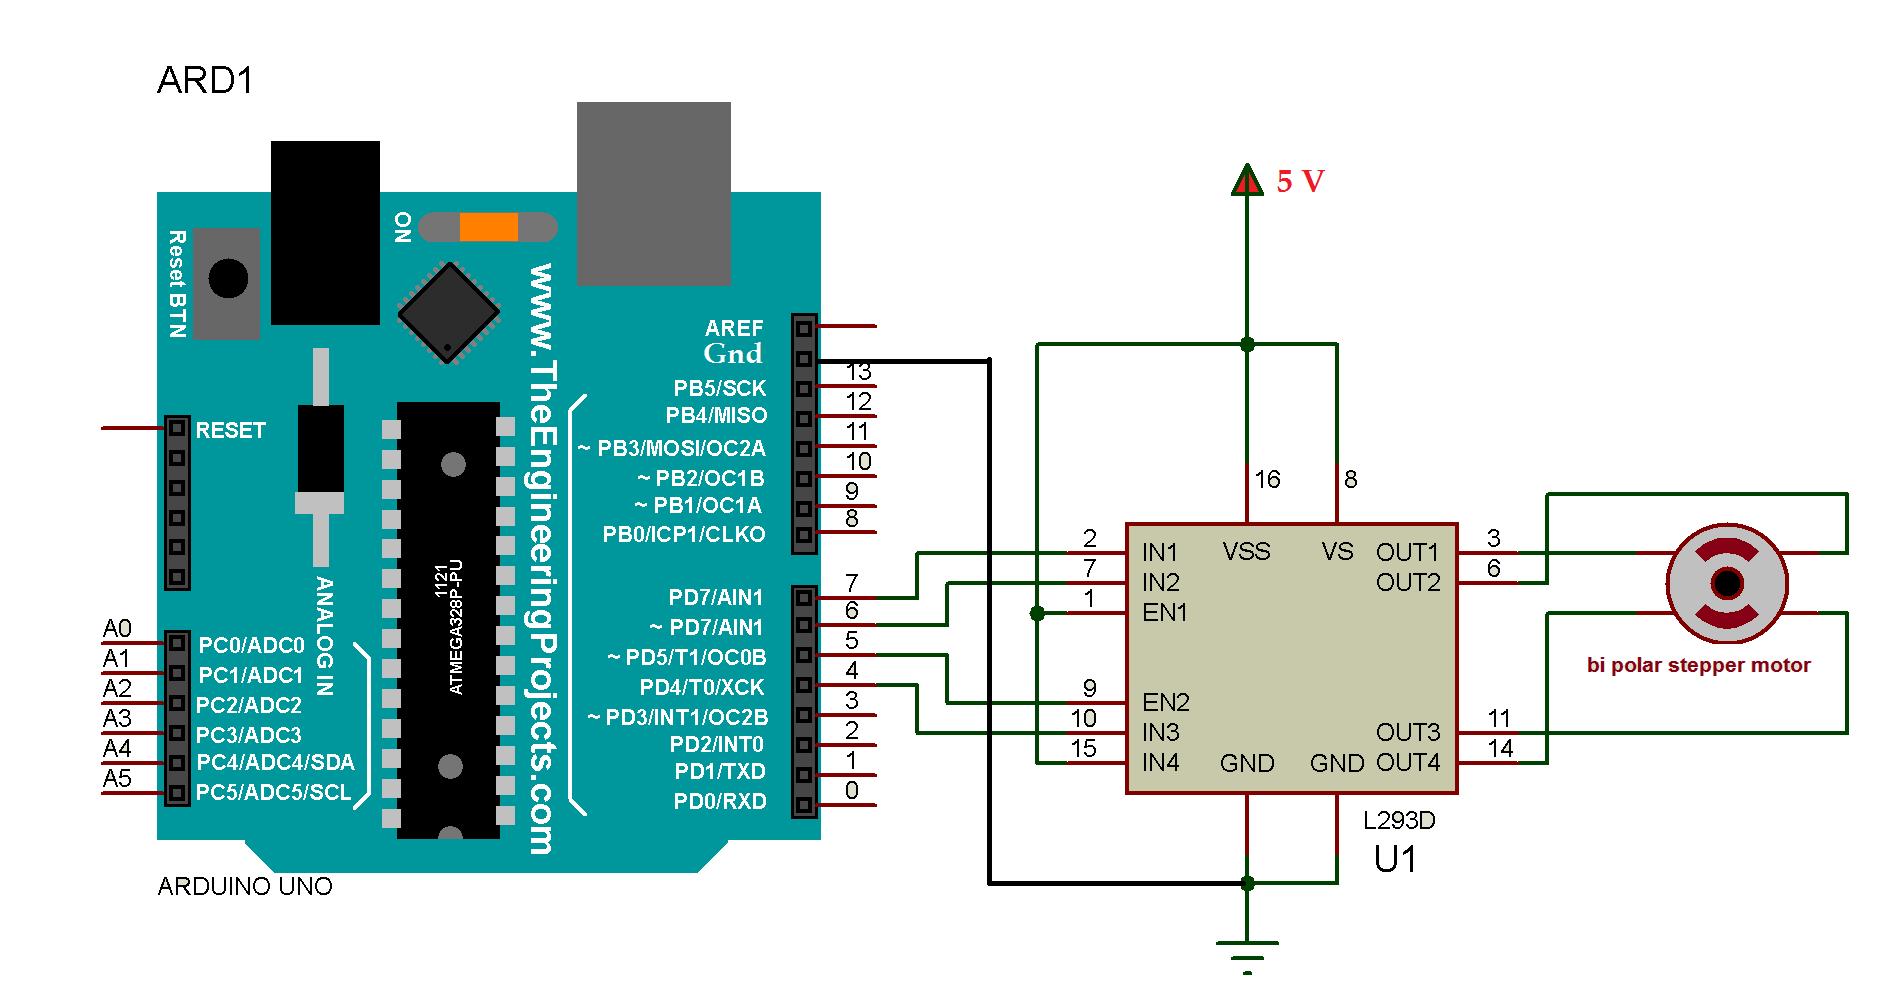 Bi polar stepper motor drive circuit for arduino yhzkxuhqv5